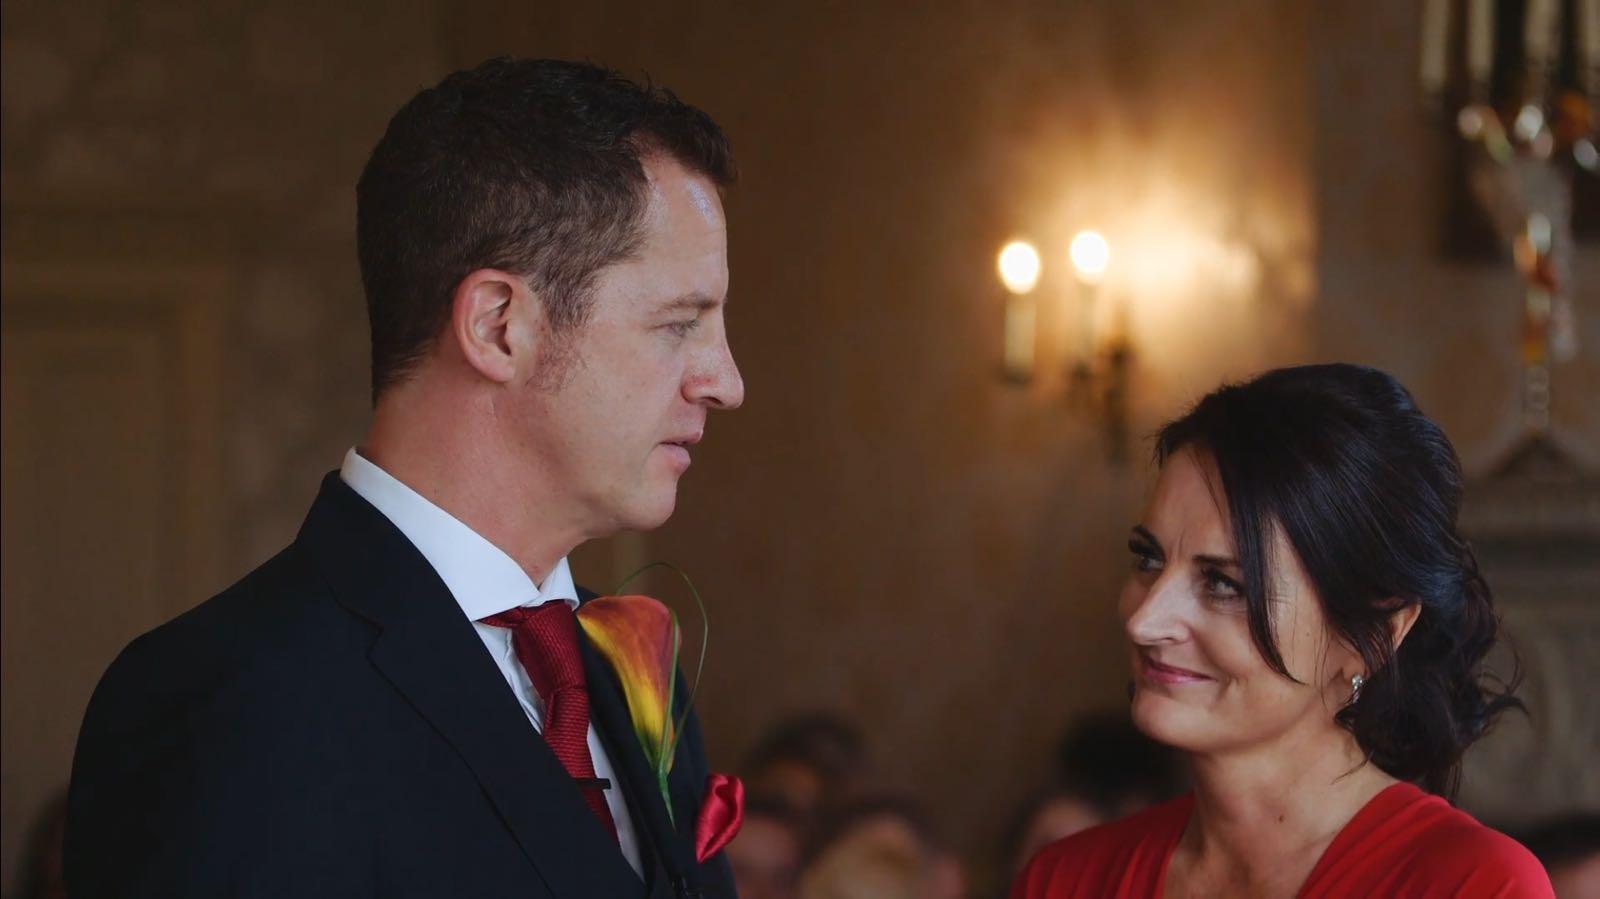 My Perfect Ceremony - Wedding Celebrant Testimonial - Alistair & Amanda